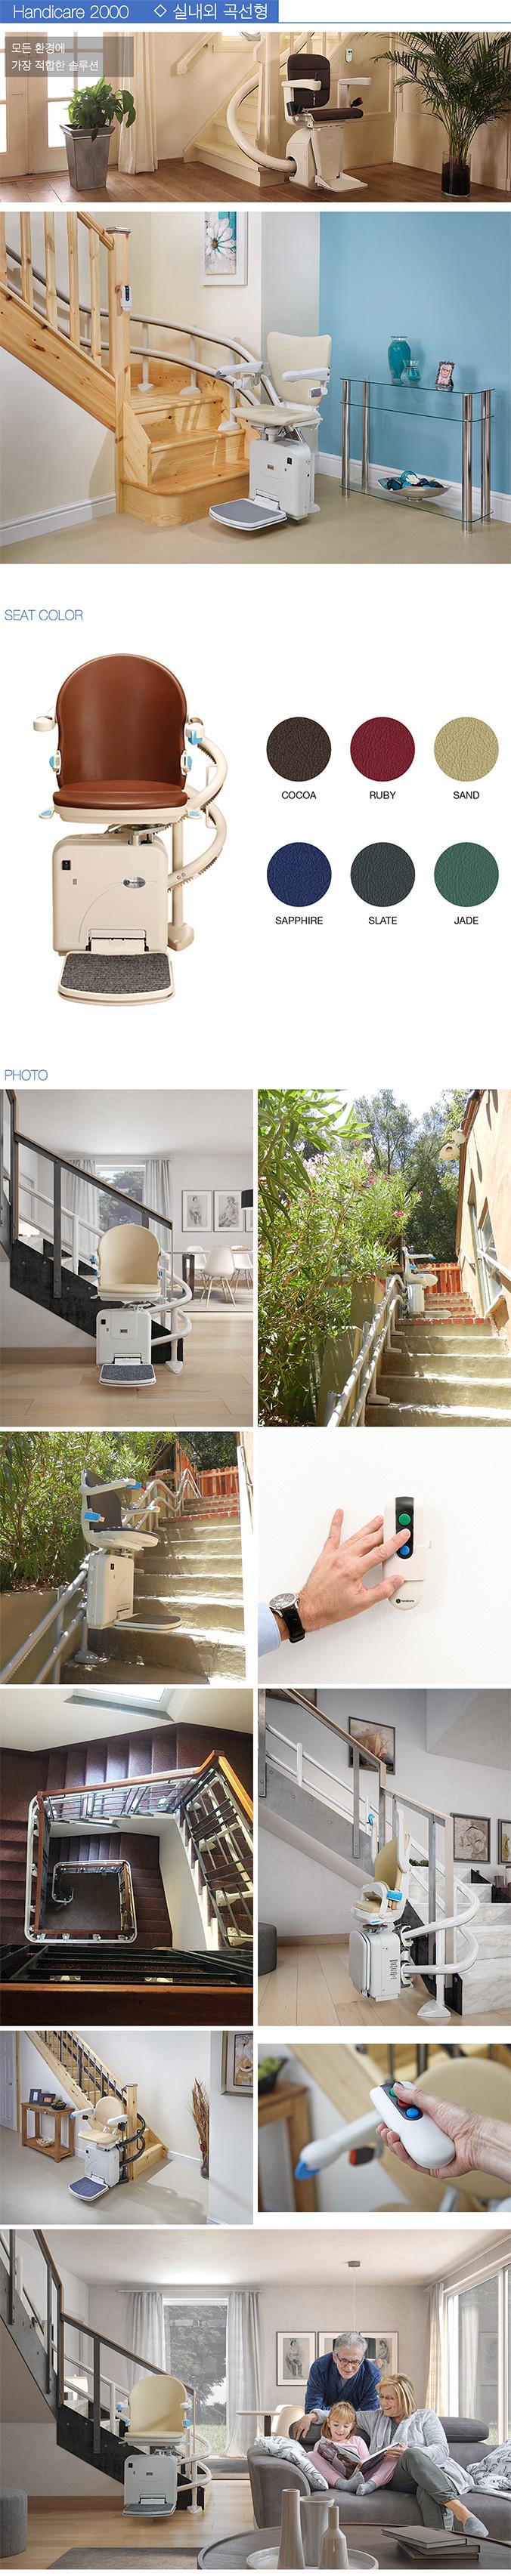 products_Handicare2000_W676.jpg